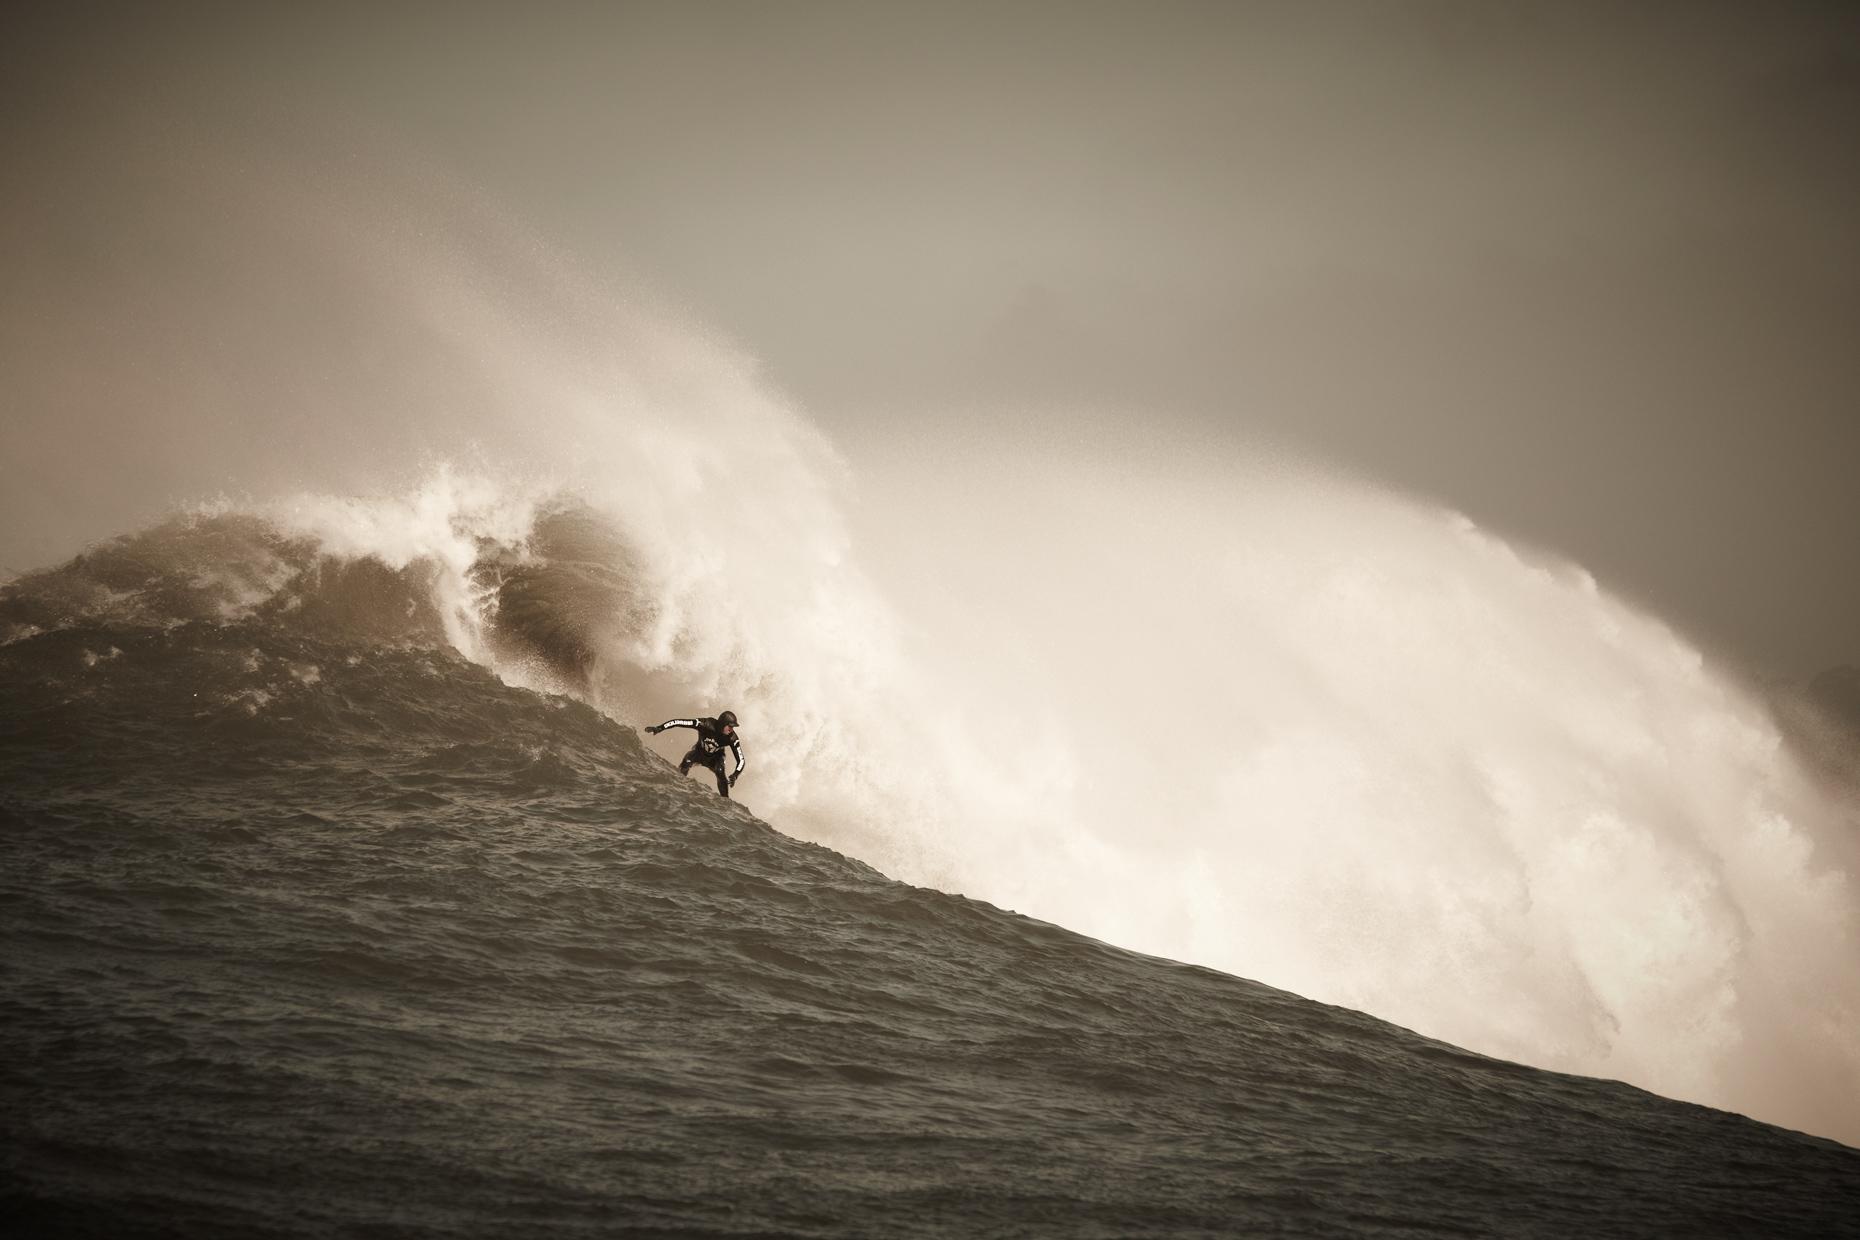 Projects Action Photography Derek Israelsen 015 Surfer Ocean Spray